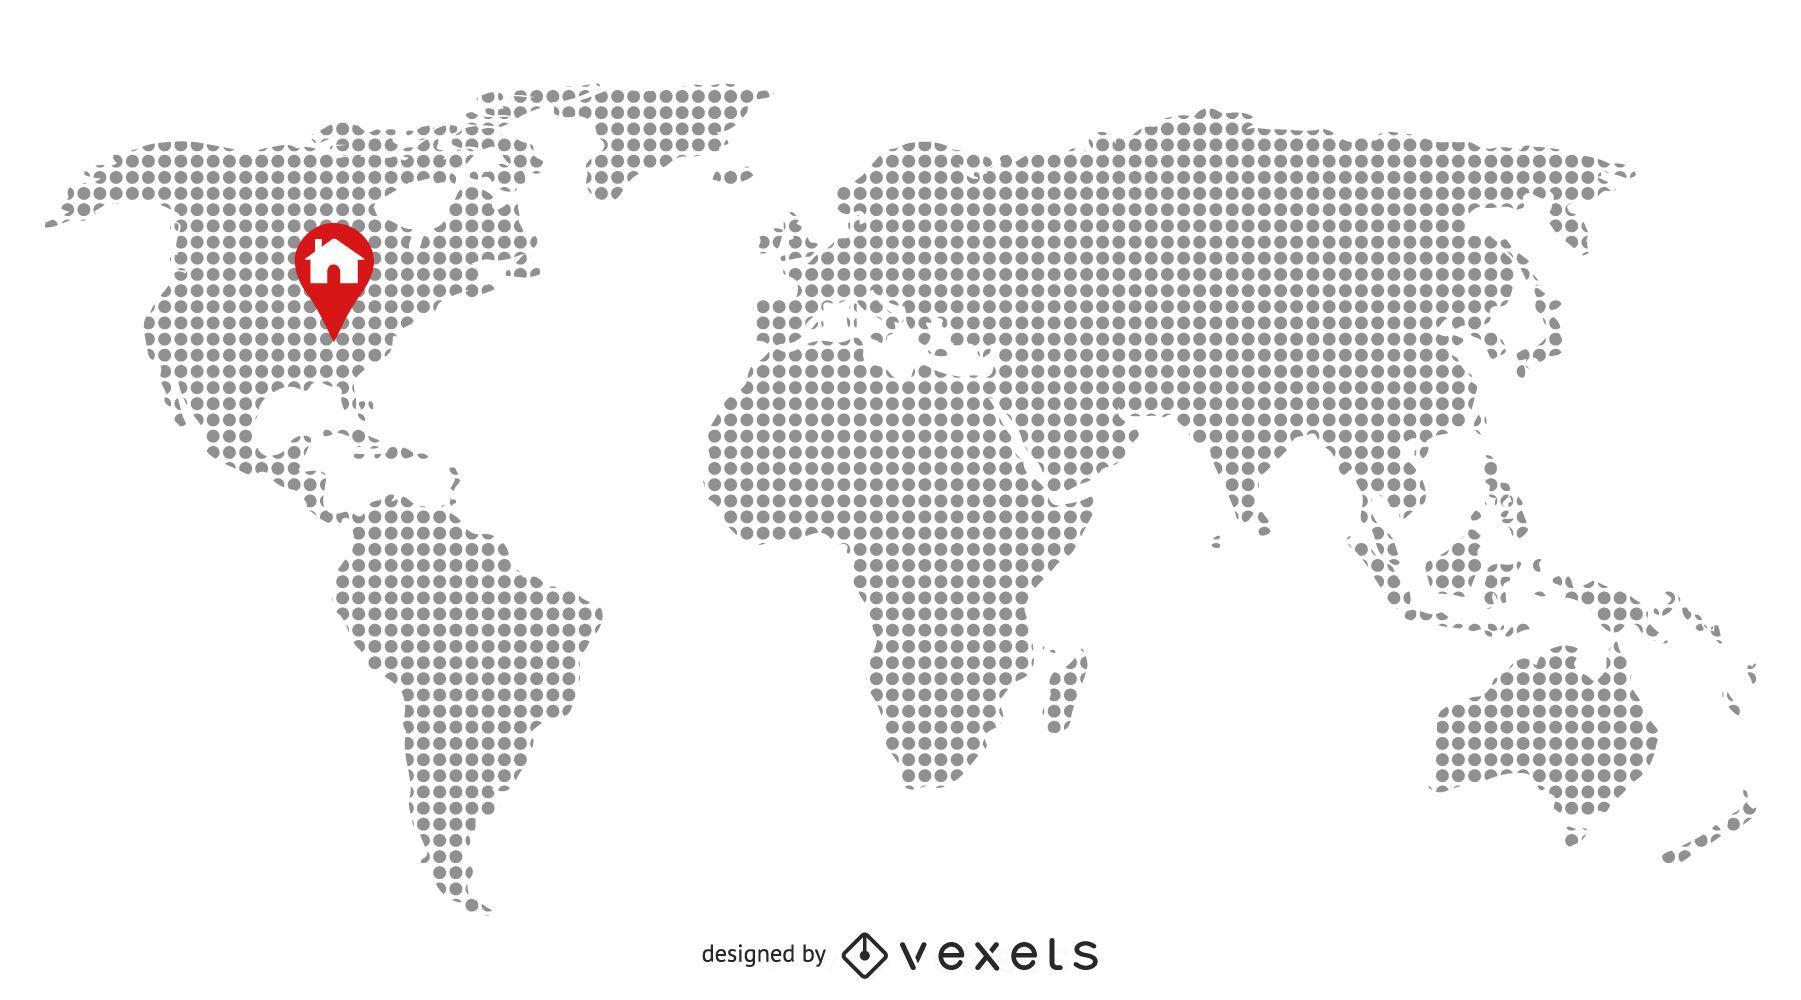 Mapa pixelado con ubicación de inicio